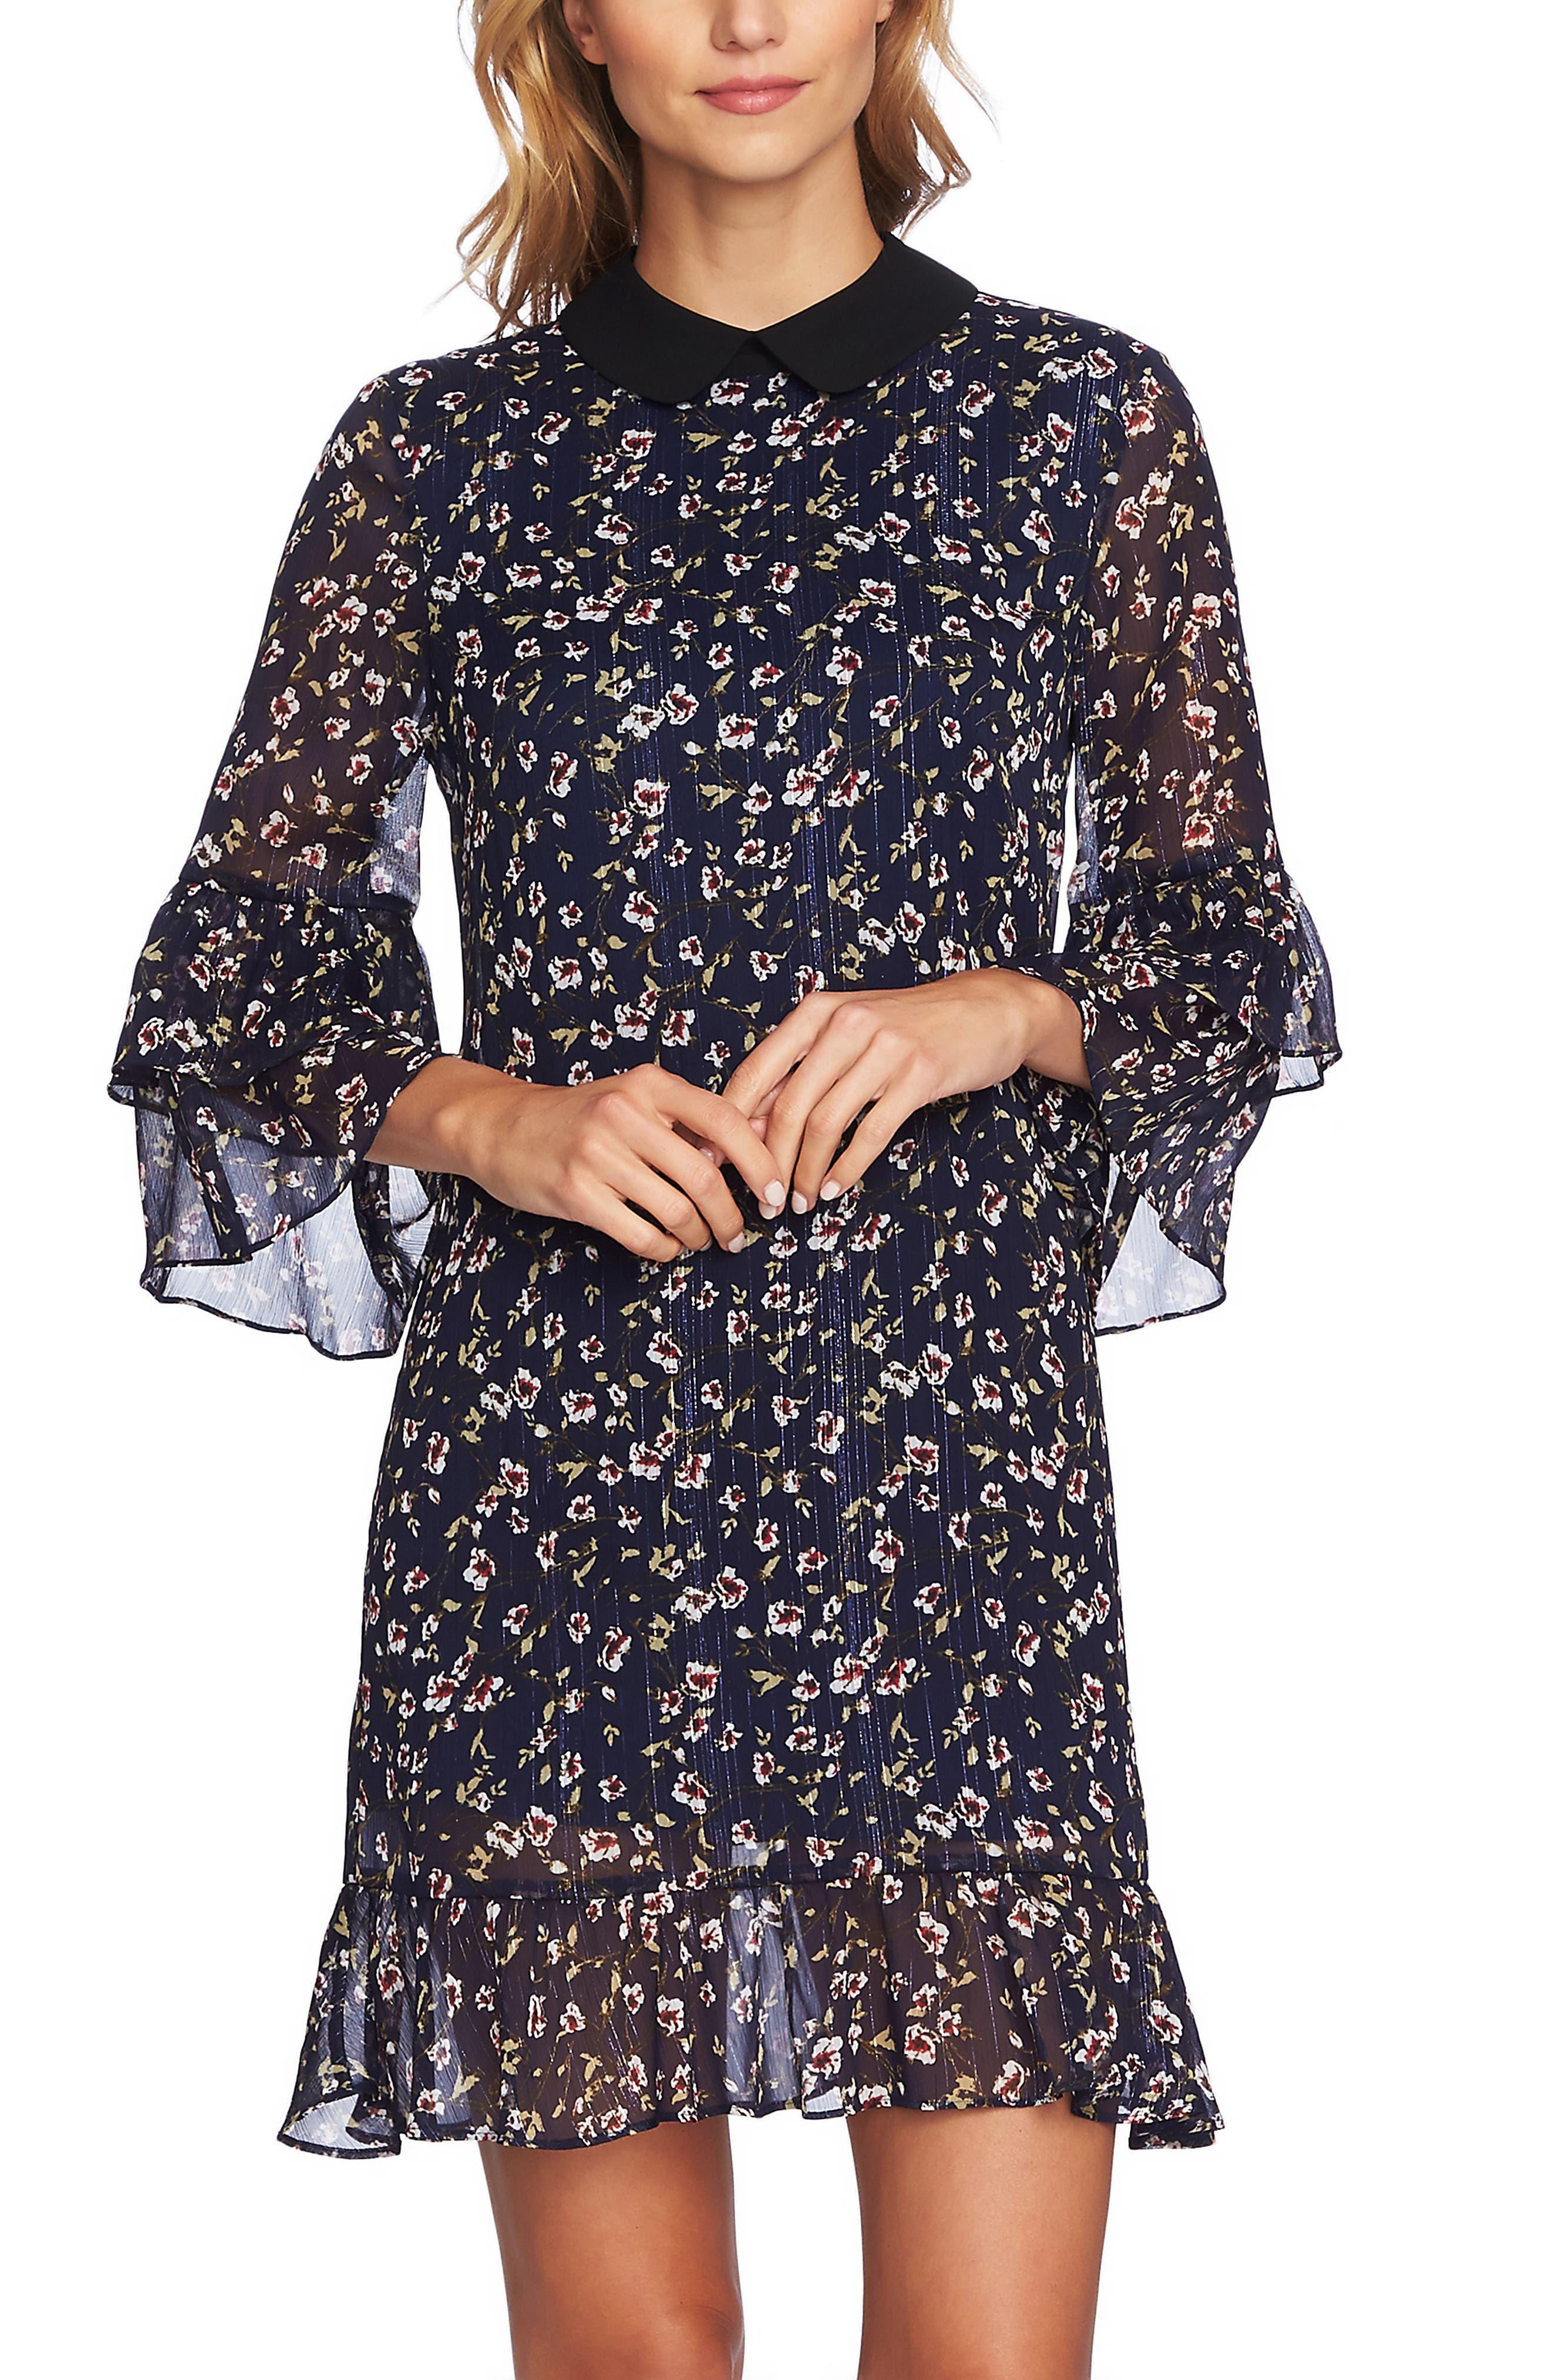 Festive Metallic Stripe Floral Ruffle Dress,                             Alternate thumbnail 5, color,                             MIDNIGHT BLOOM